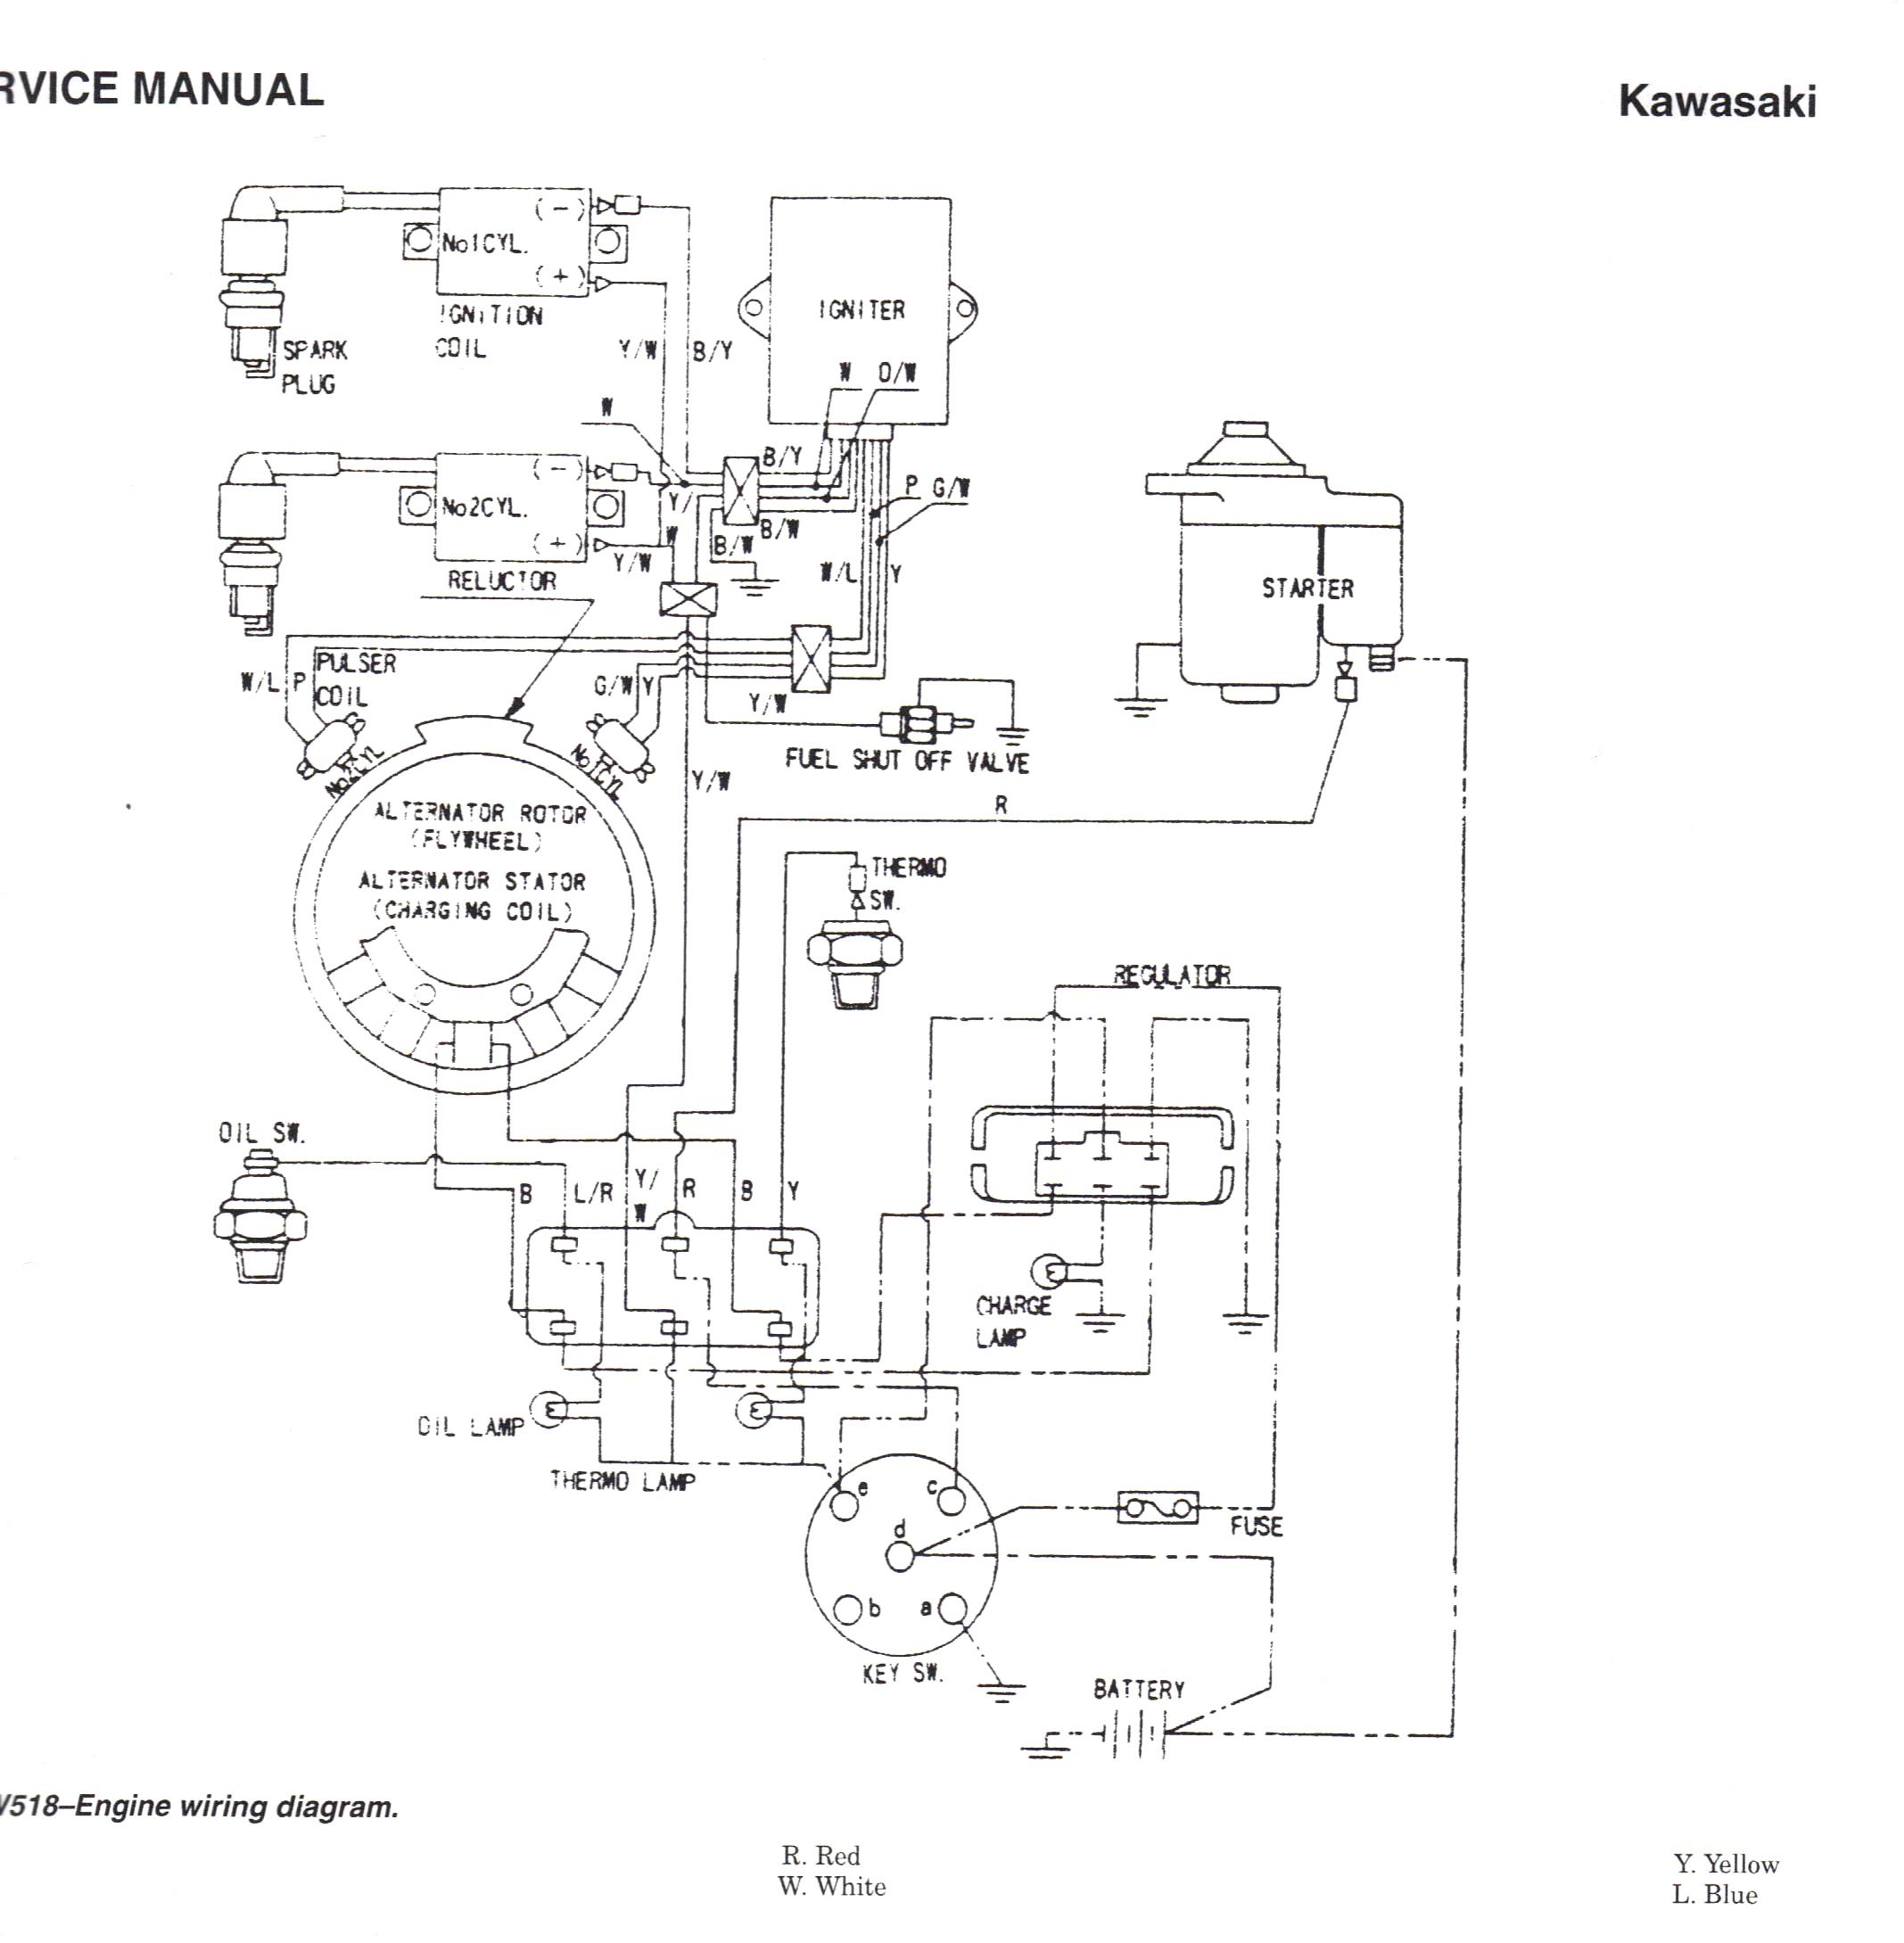 John Deere La135 Wiring Diagram | Wiring Diagram - John Deere Wiring Diagram Download